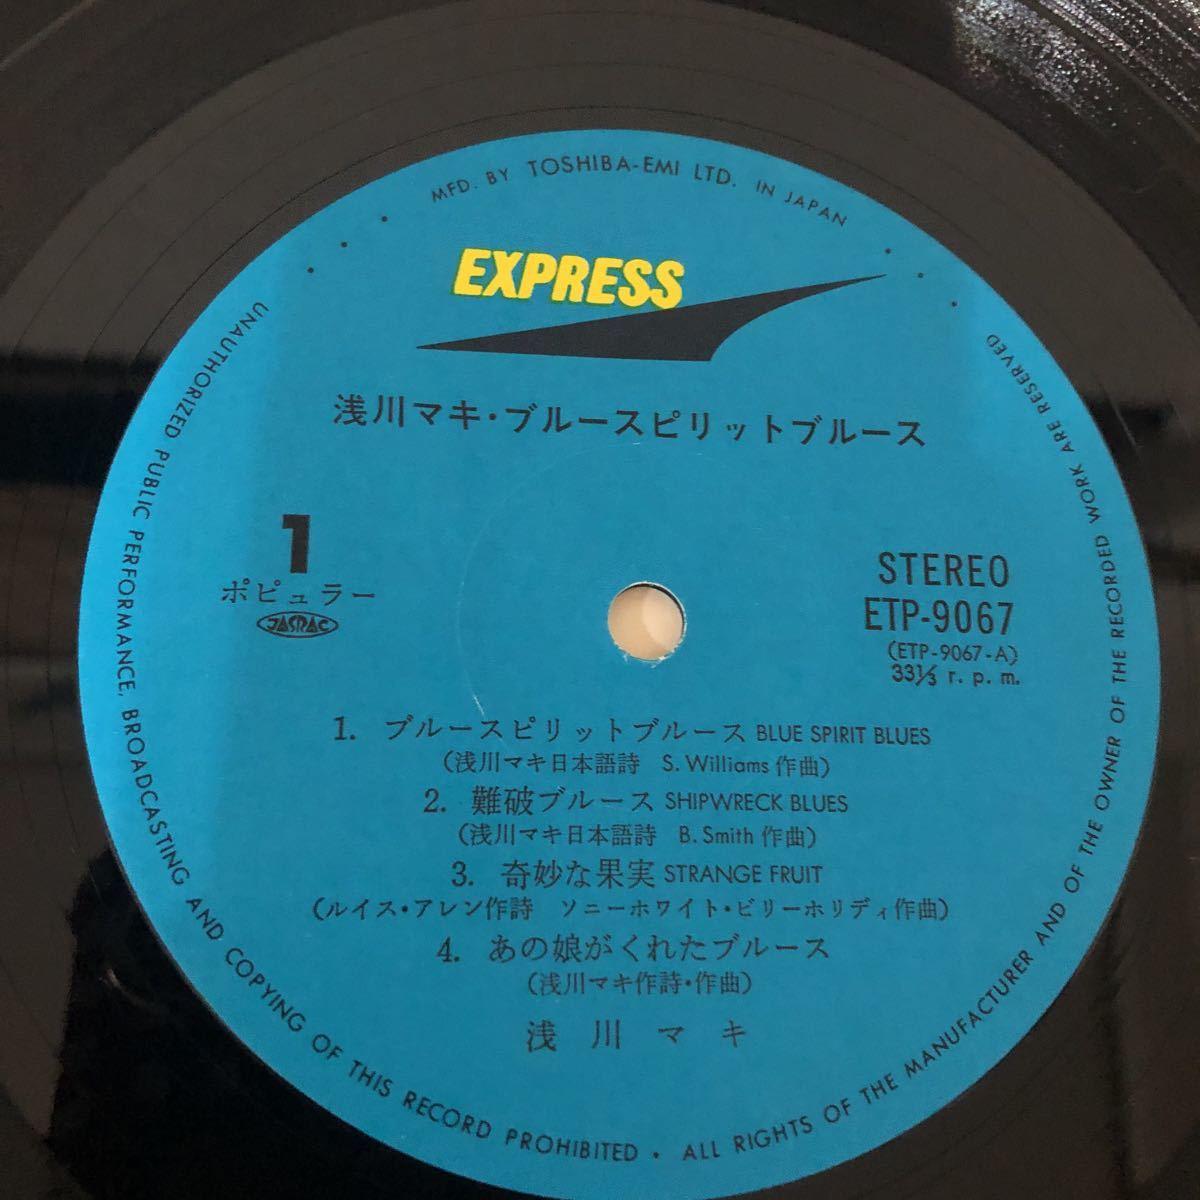 LPレコード★邦楽☆★浅川マキ★ブルースピリットブルース レコード多数出品中_画像7